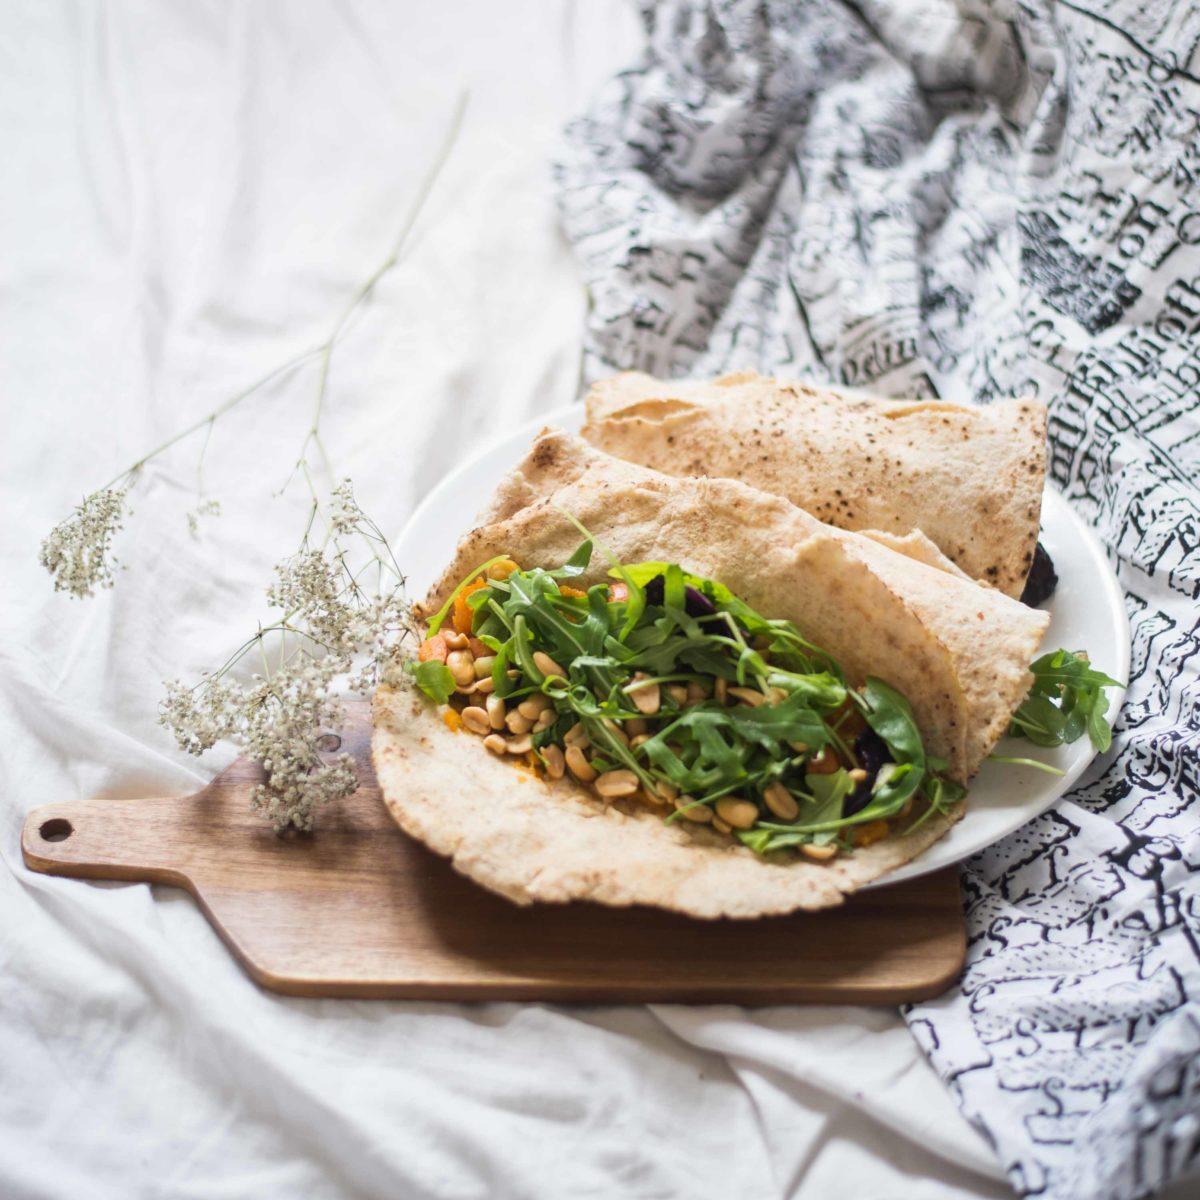 Vegan Cinnamon-Squash-Wraps with Veggies